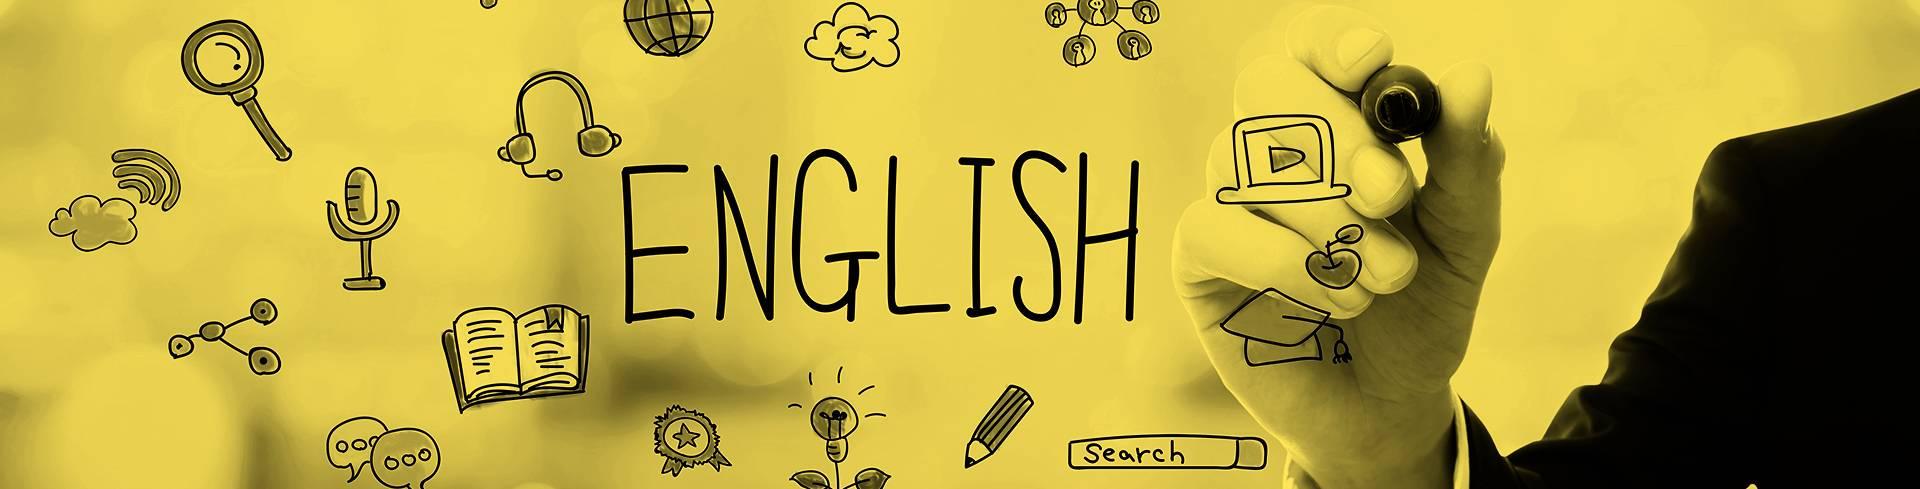 Workshop Retraining English Language Teachers for 21st Century Students